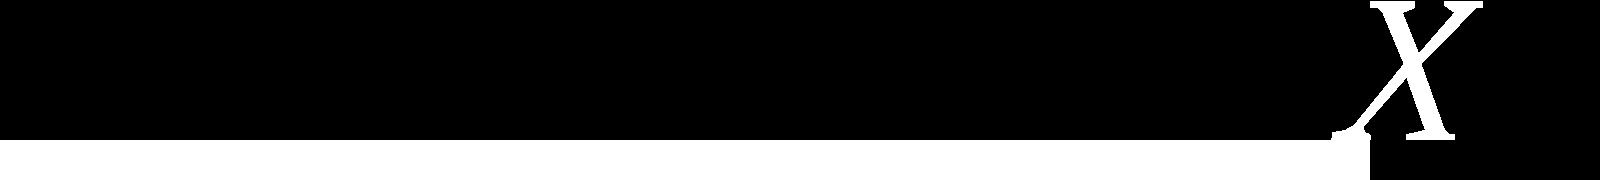 L'Expert Carrossier - Icône X du logo en blanc avec ligne